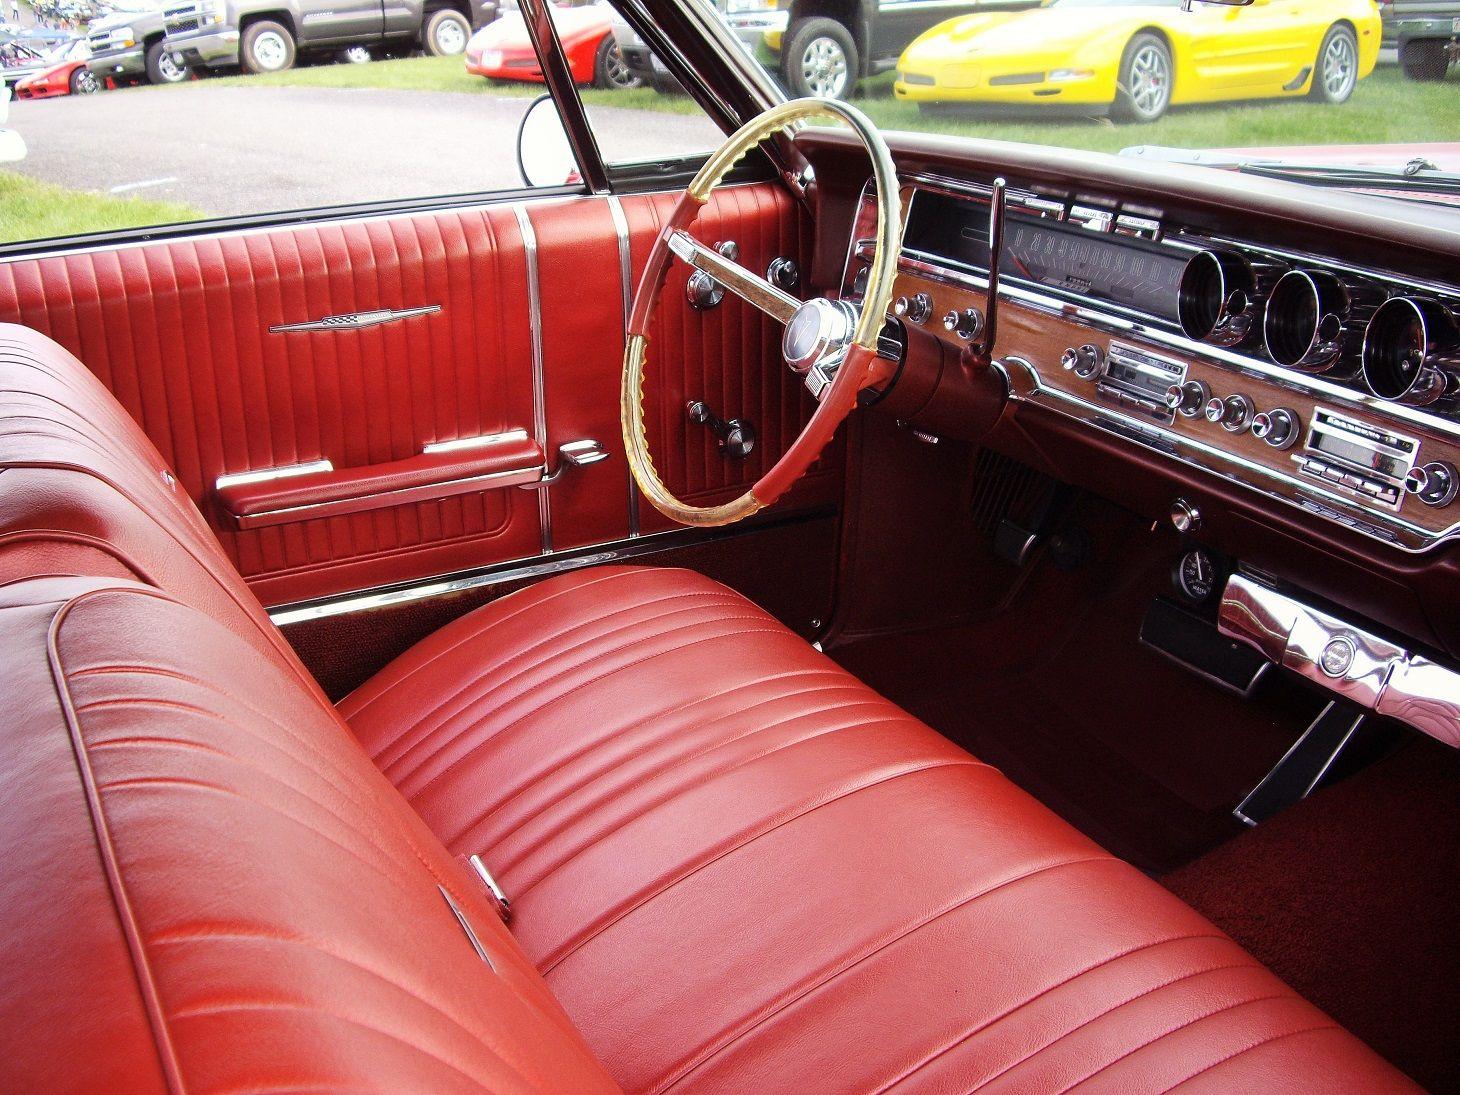 1965 pontiac bonneville interior classic car interiors pinterest 1965 pontiac bonneville interior publicscrutiny Images